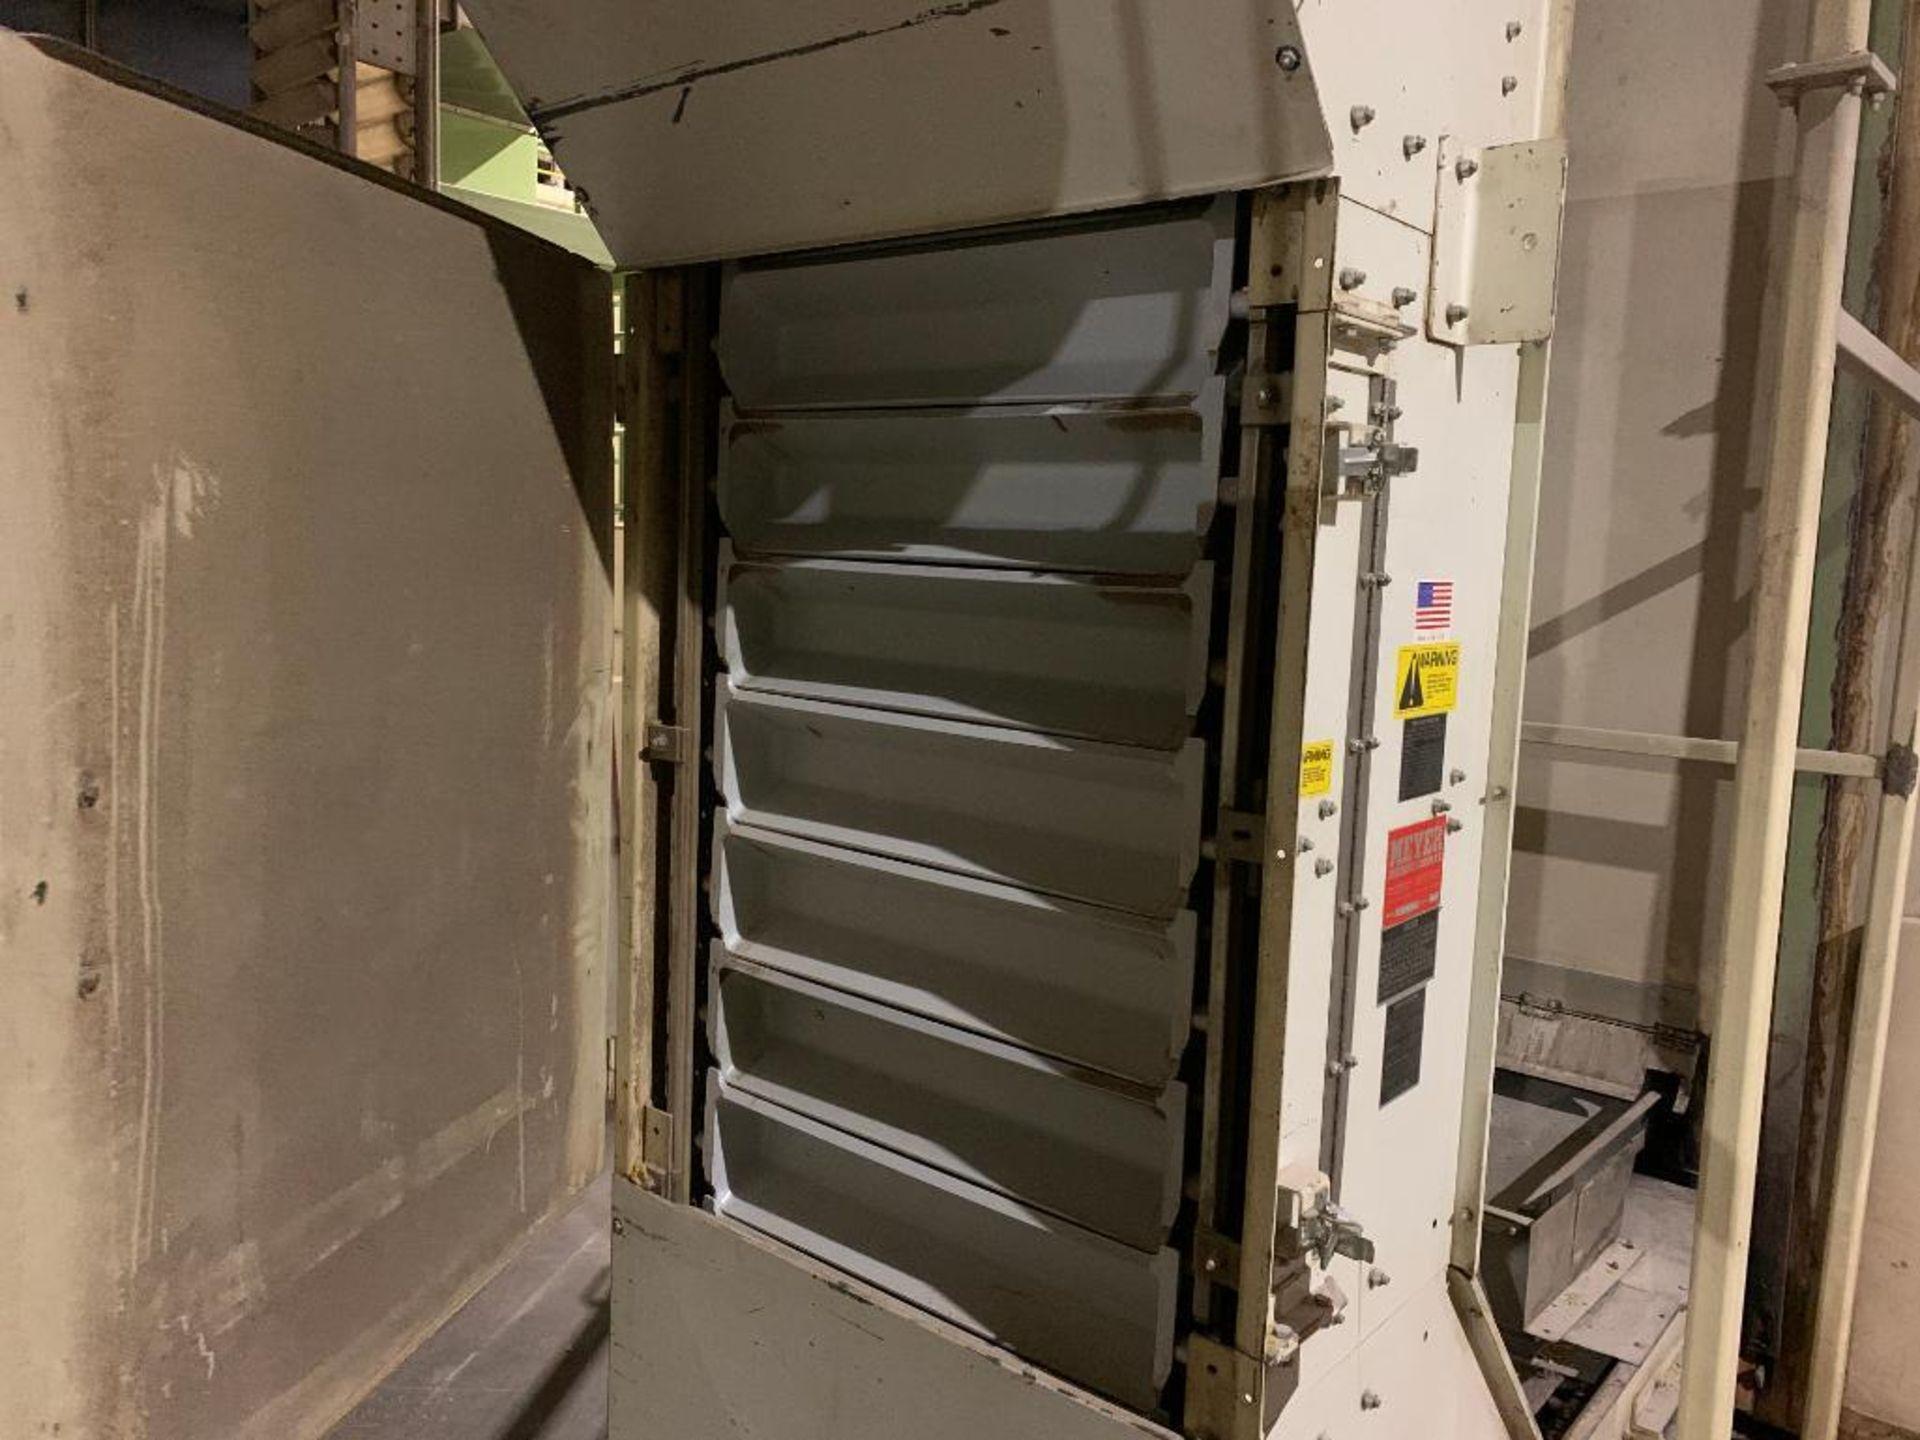 Meyer overlapping bucket elevator, model PA462-24-S - Image 15 of 17